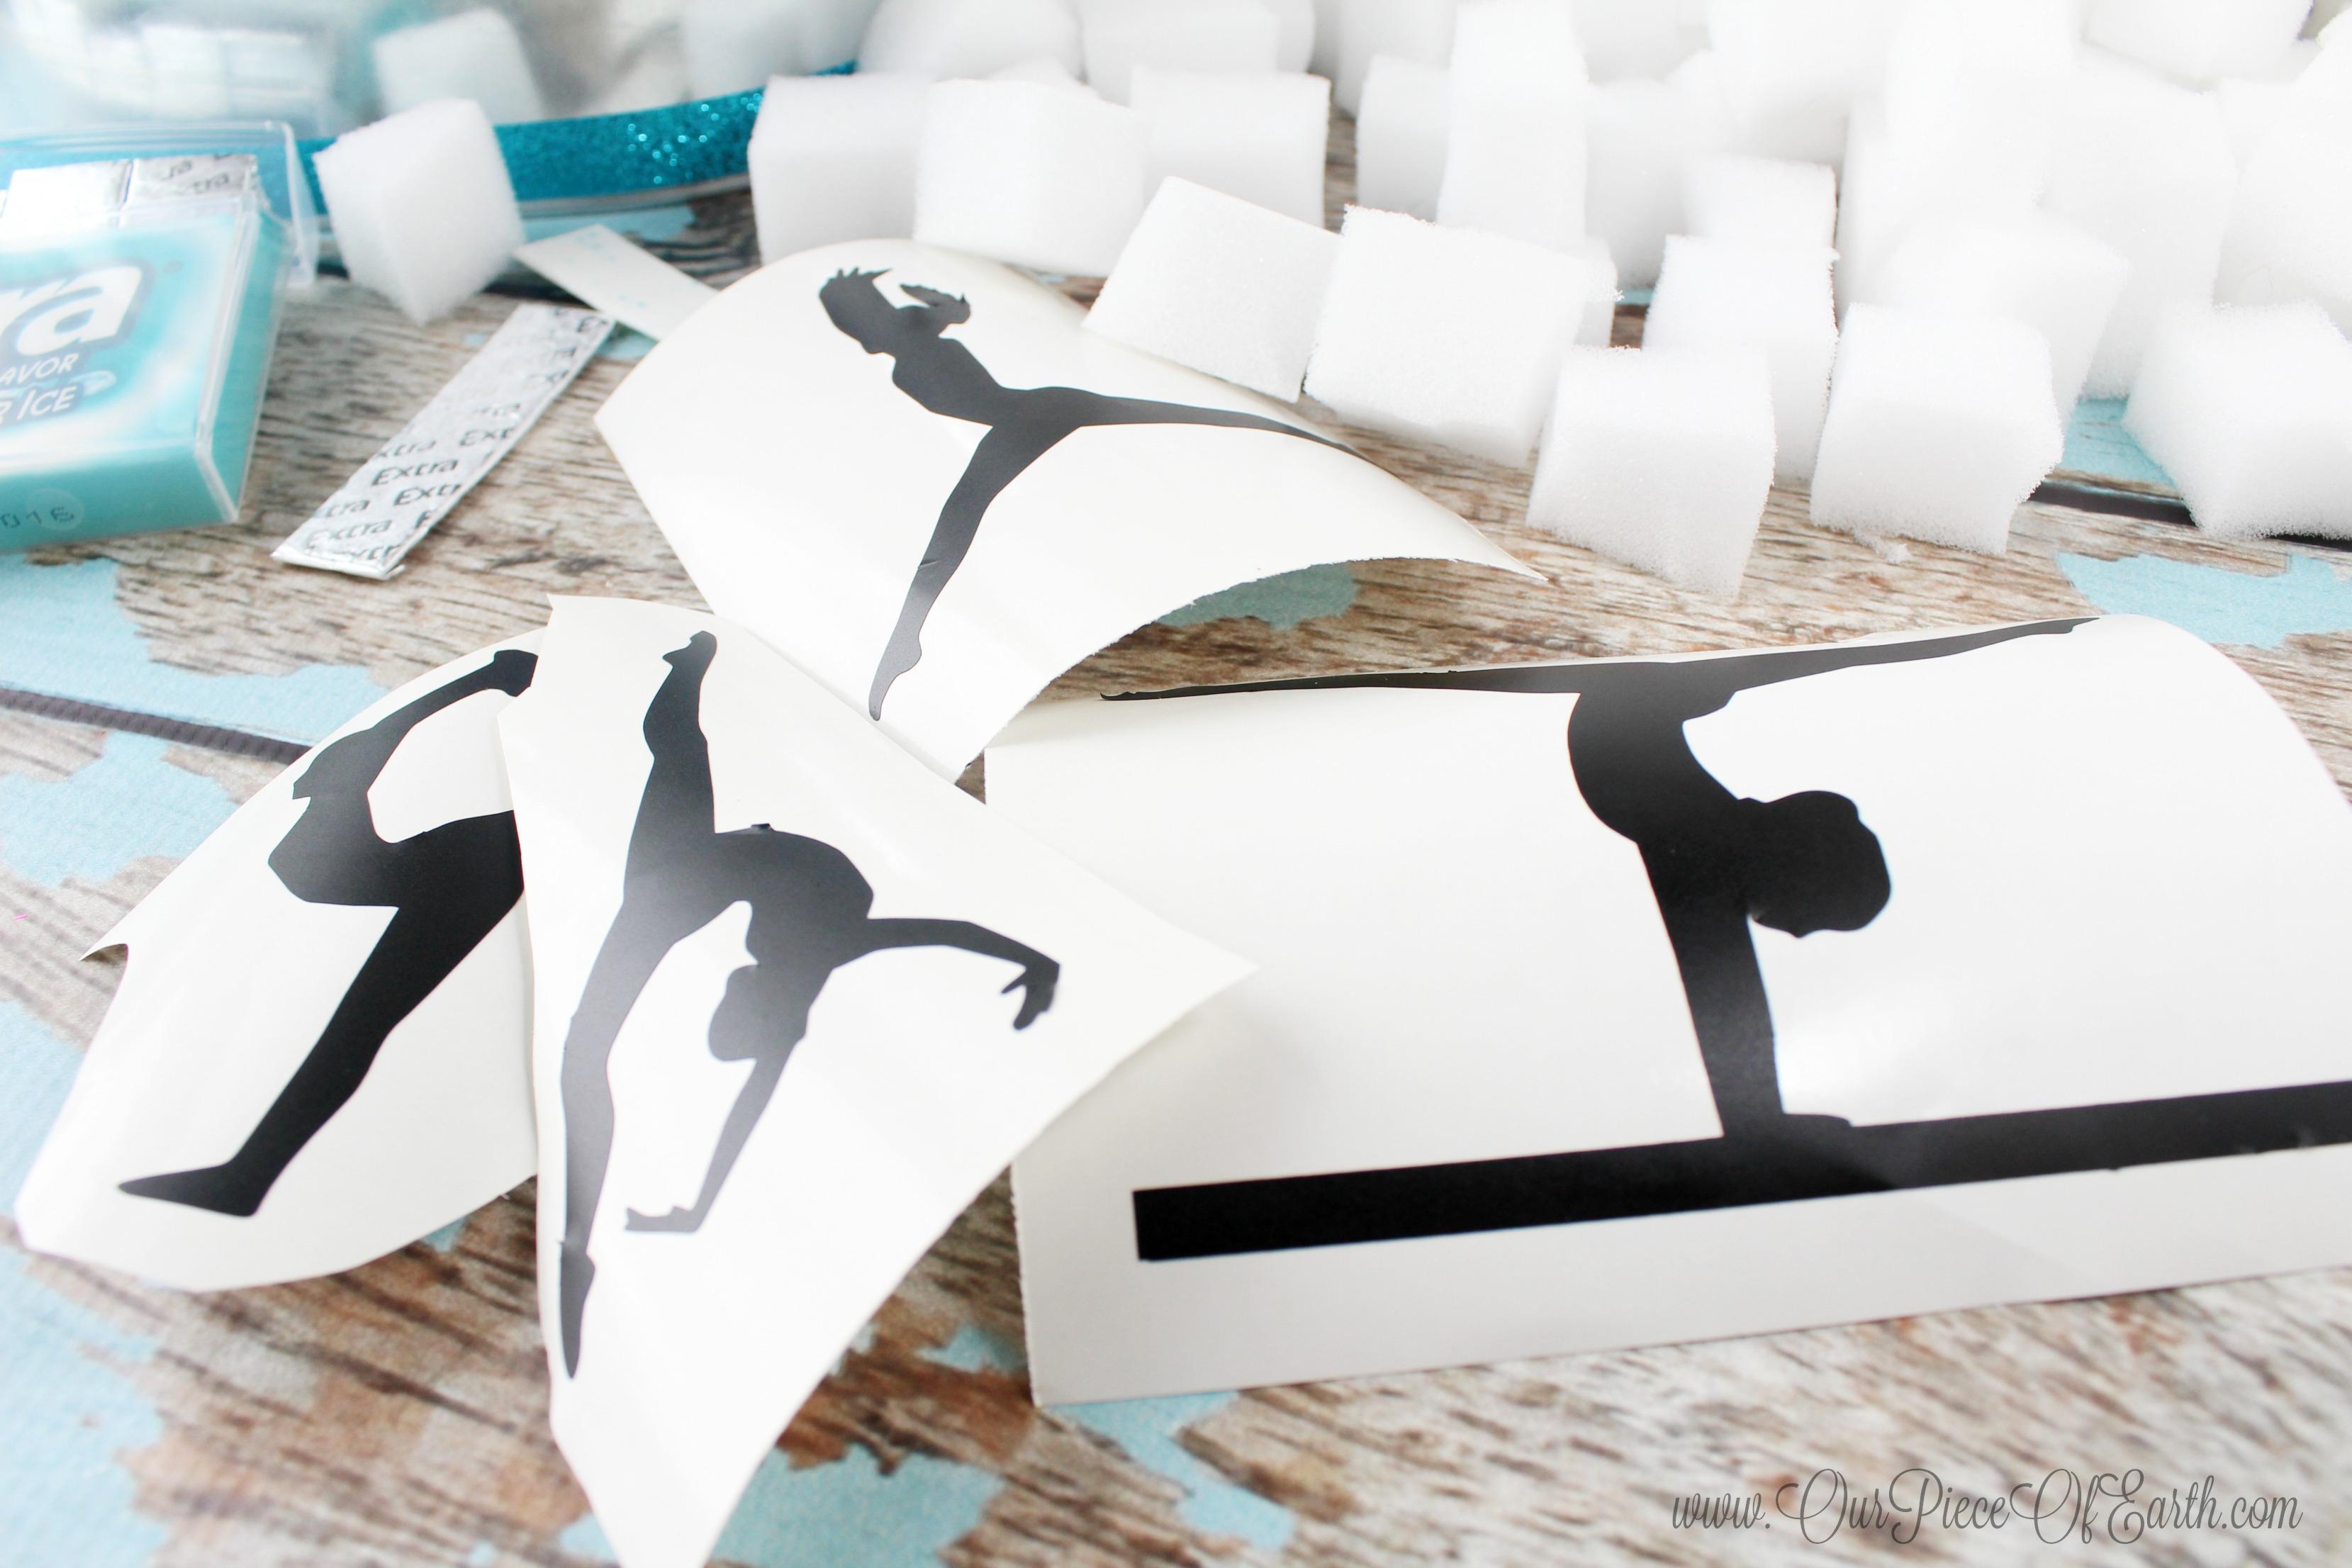 Gymnastics Silhouettes #GIVEEXTRAGETEXTRA